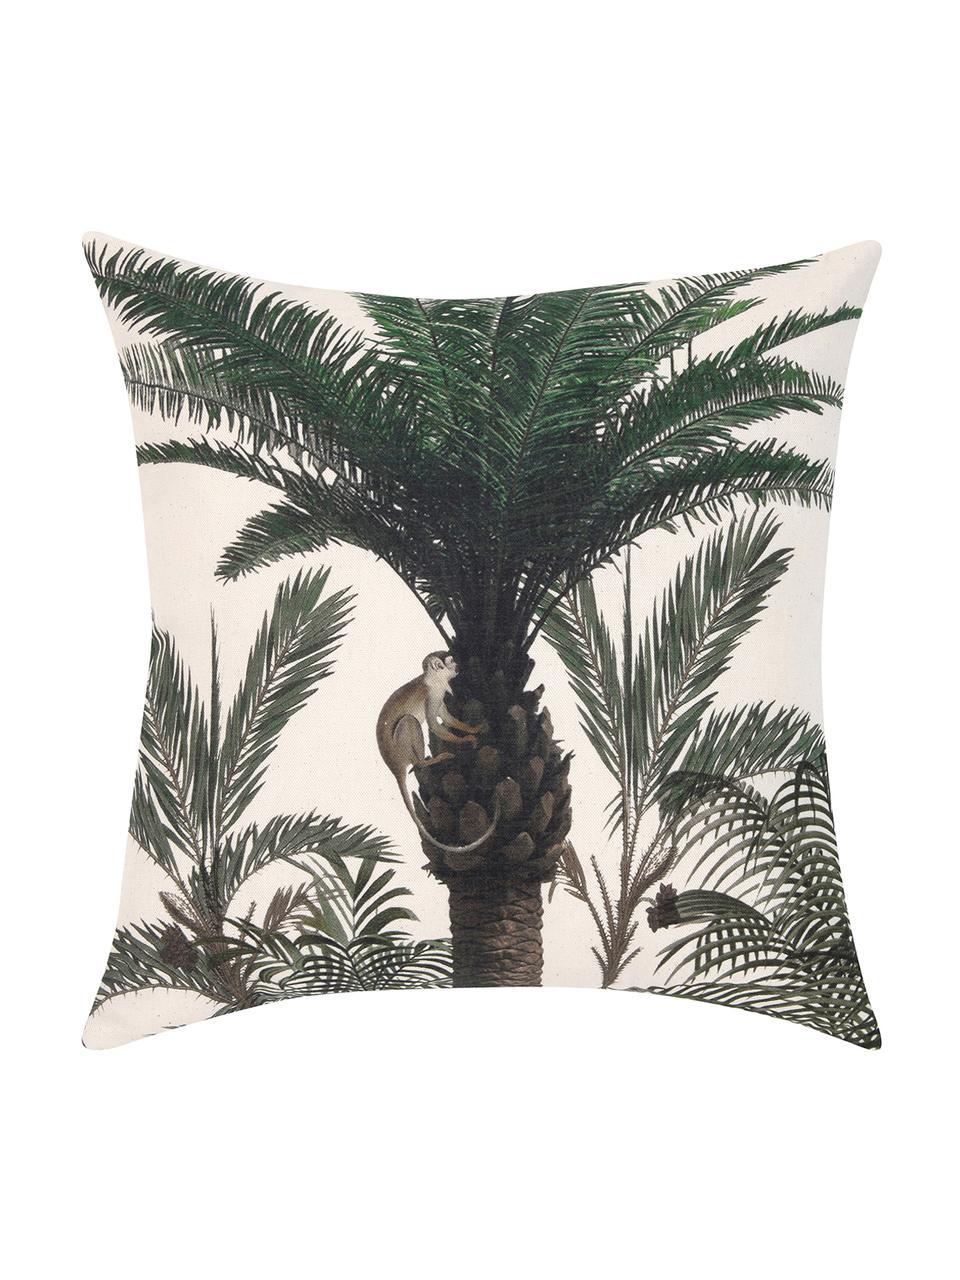 Kissenhülle Balu mit Palmenprint, 100% Baumwolle, Ecru, Grün, 40 x 40 cm